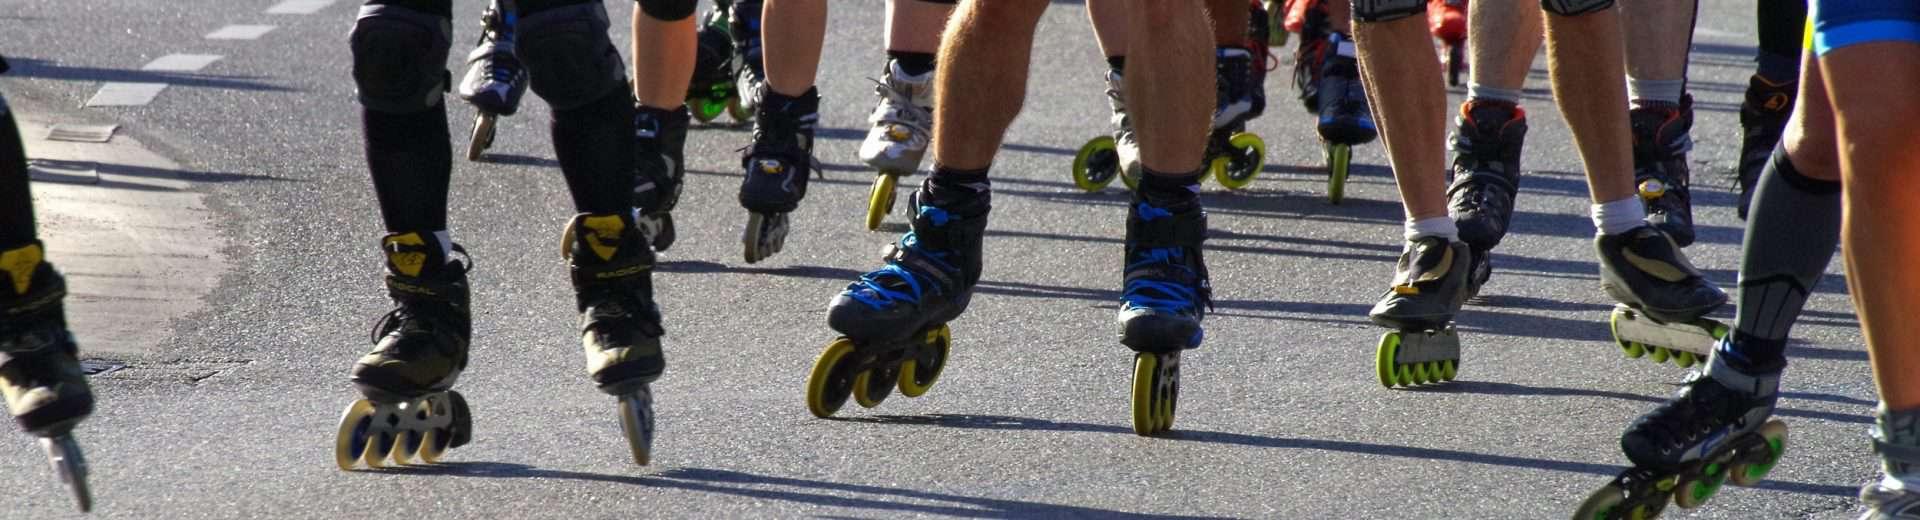 mehrere Inlineskater, Fläming Skate